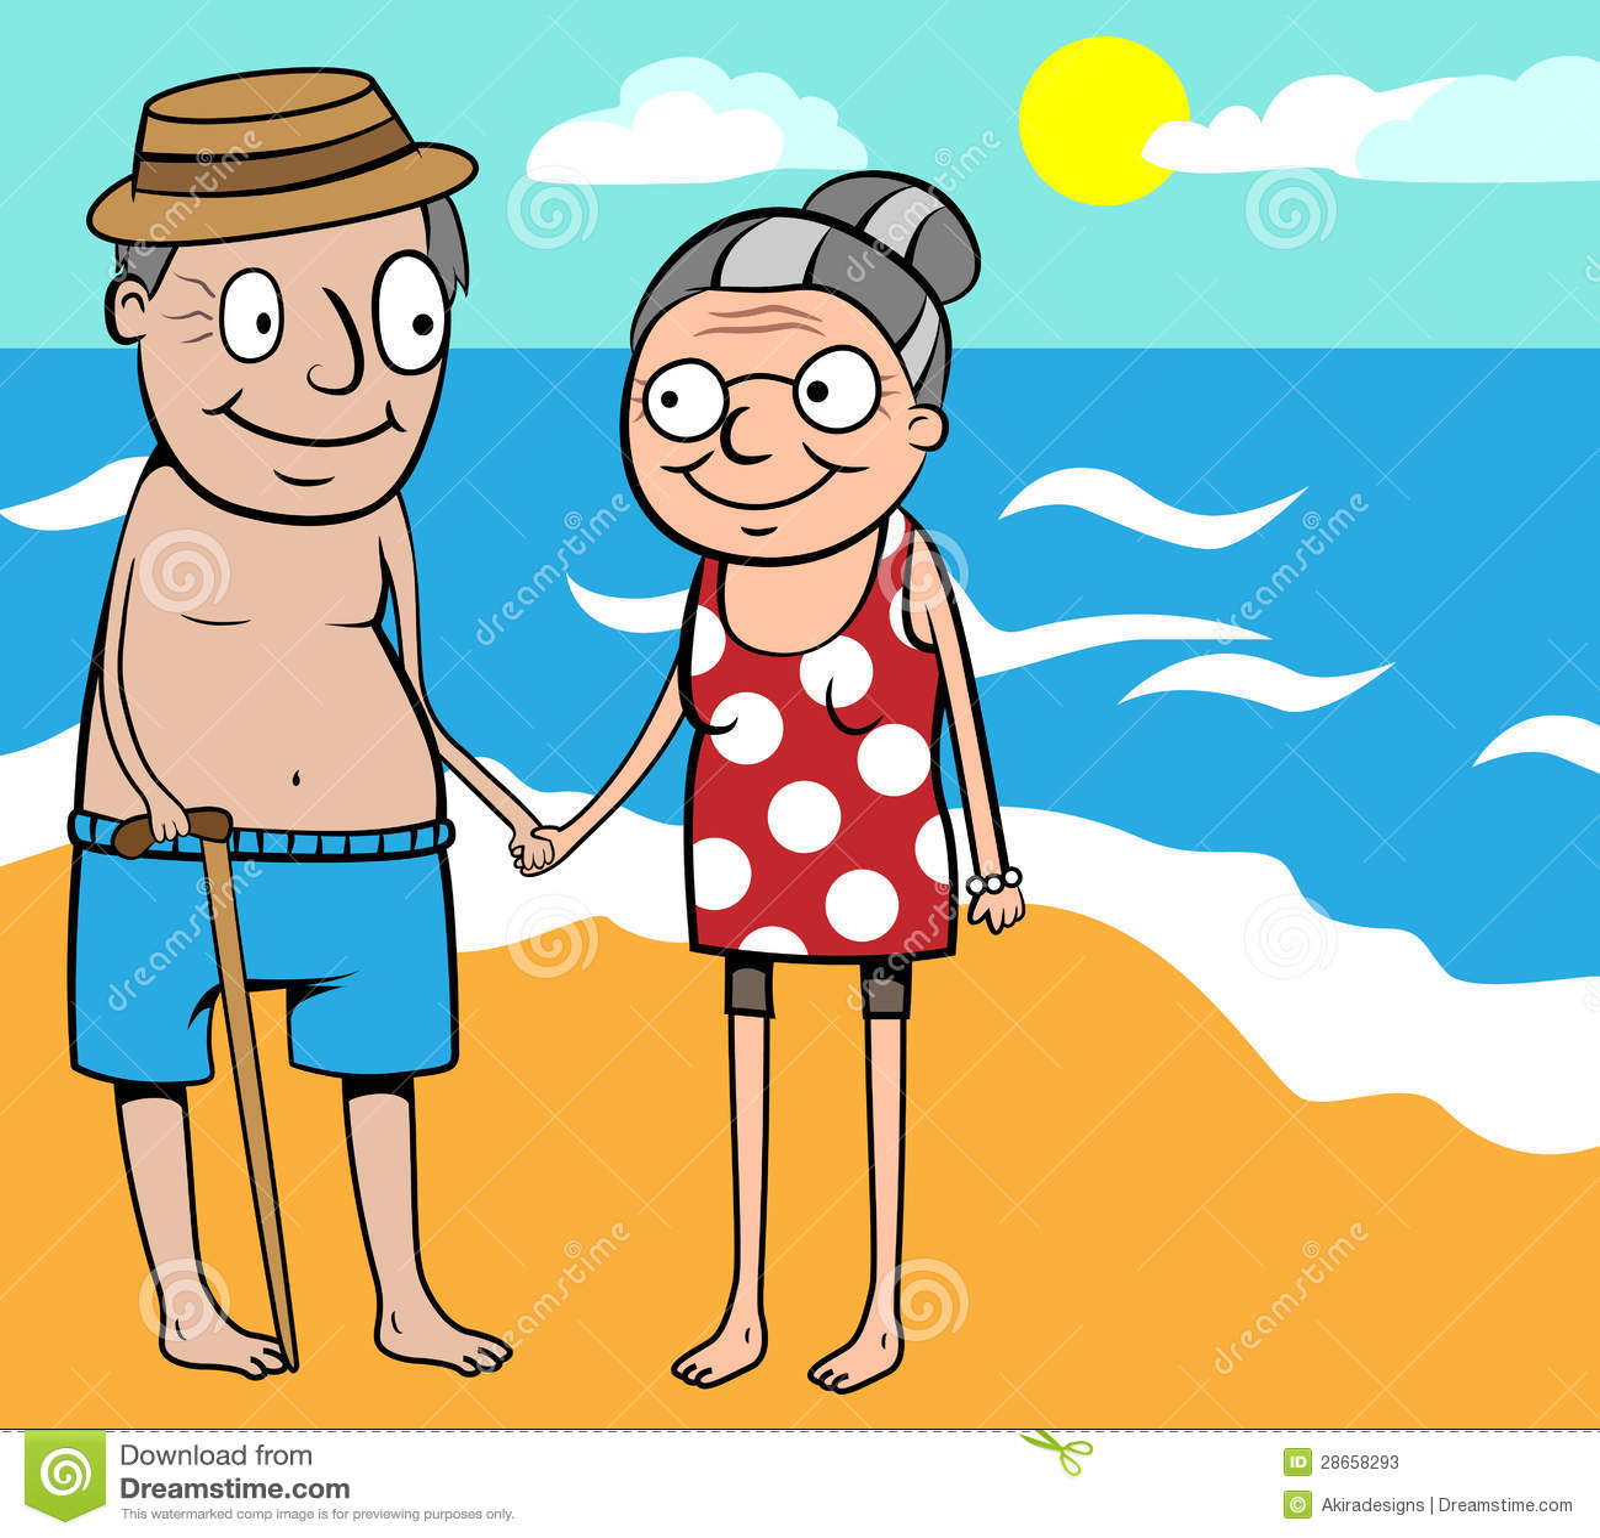 Couple Enjoying Their Summer Holidays Stock Photo: Happy Old Couple Summer Holiday By Sea Stock Vector